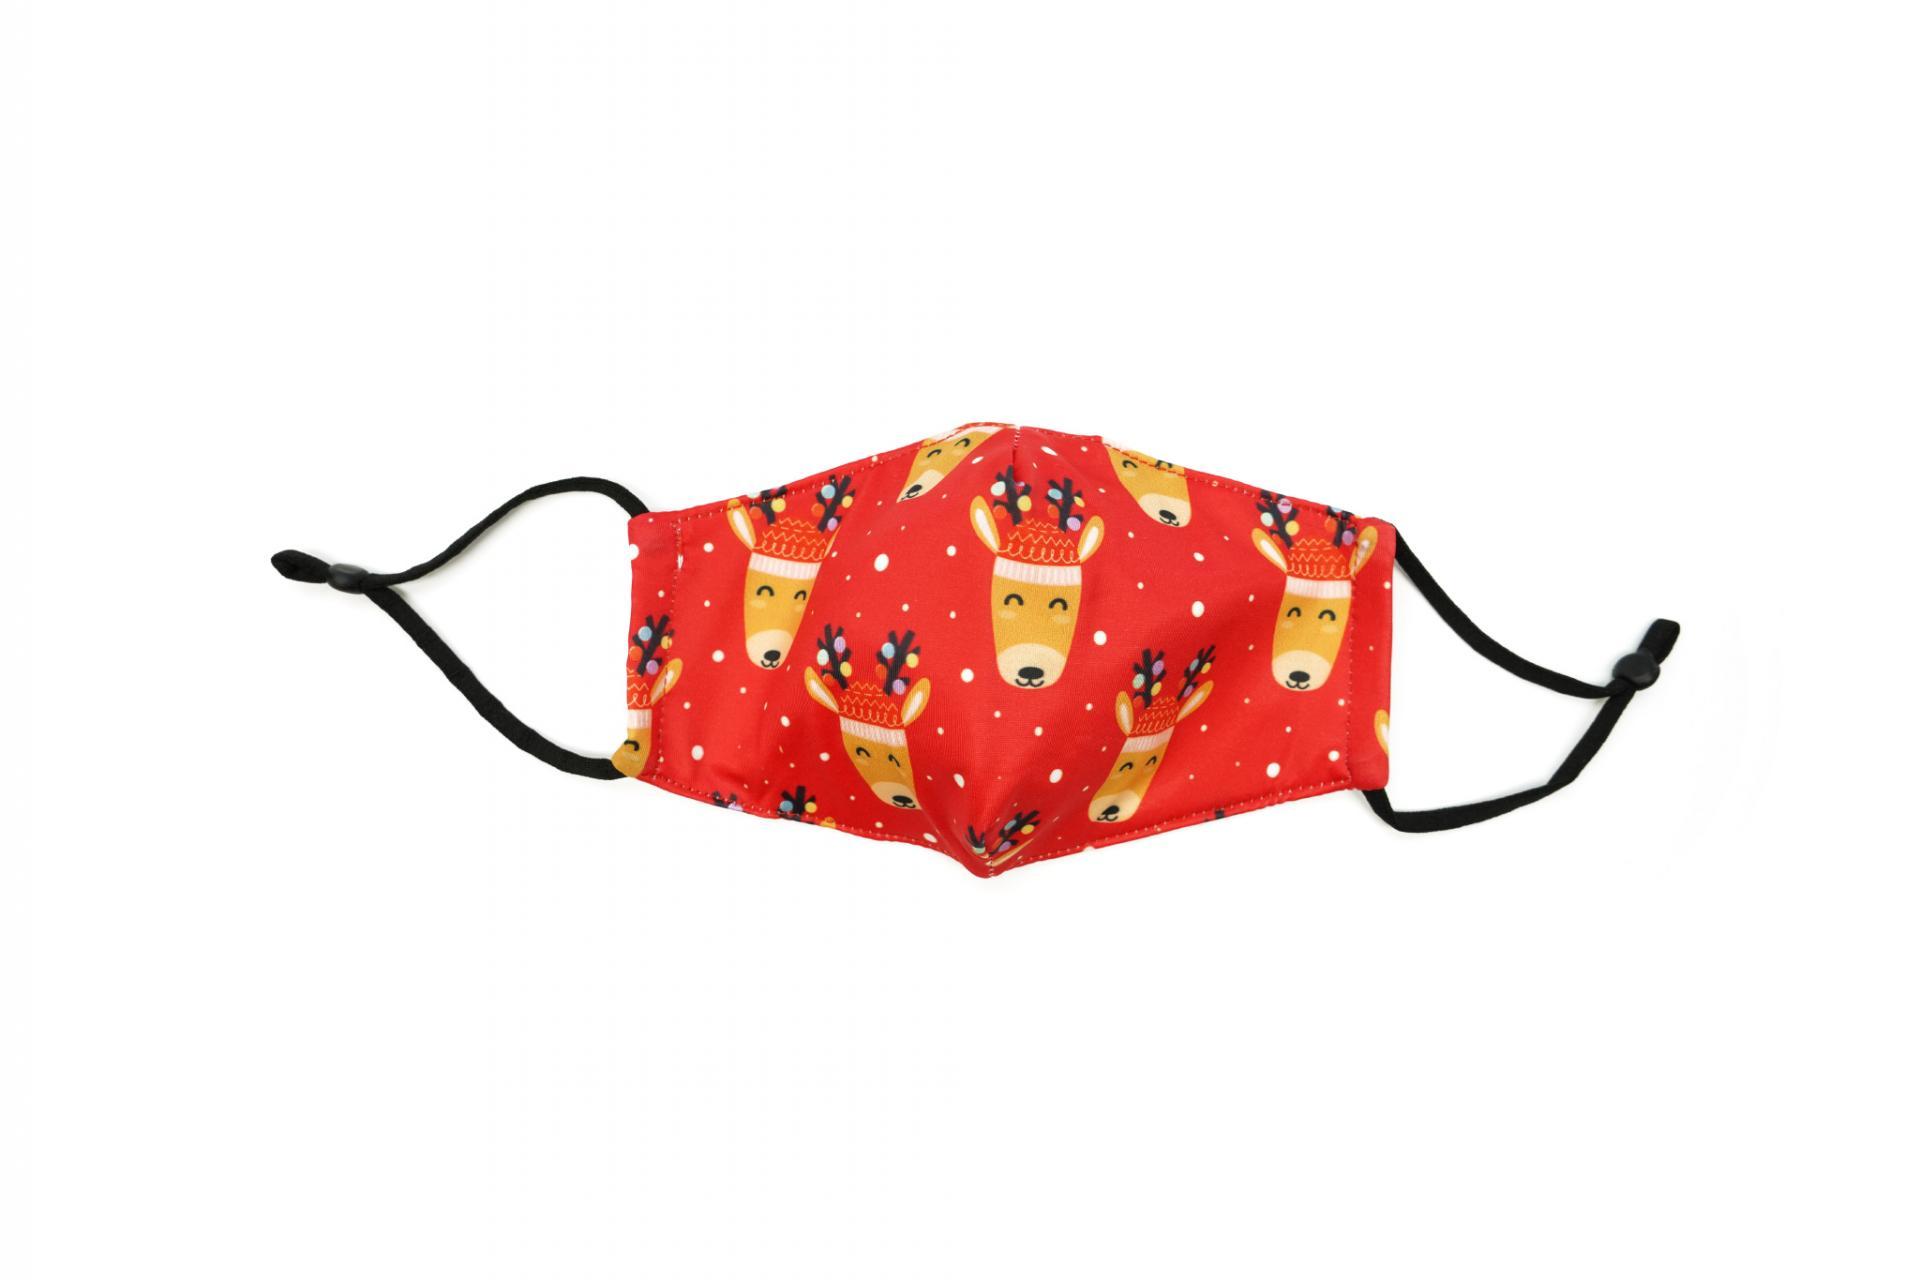 Care Cover Protective Mask Kids Reindeer. Kids protective mask with a reindeer print.